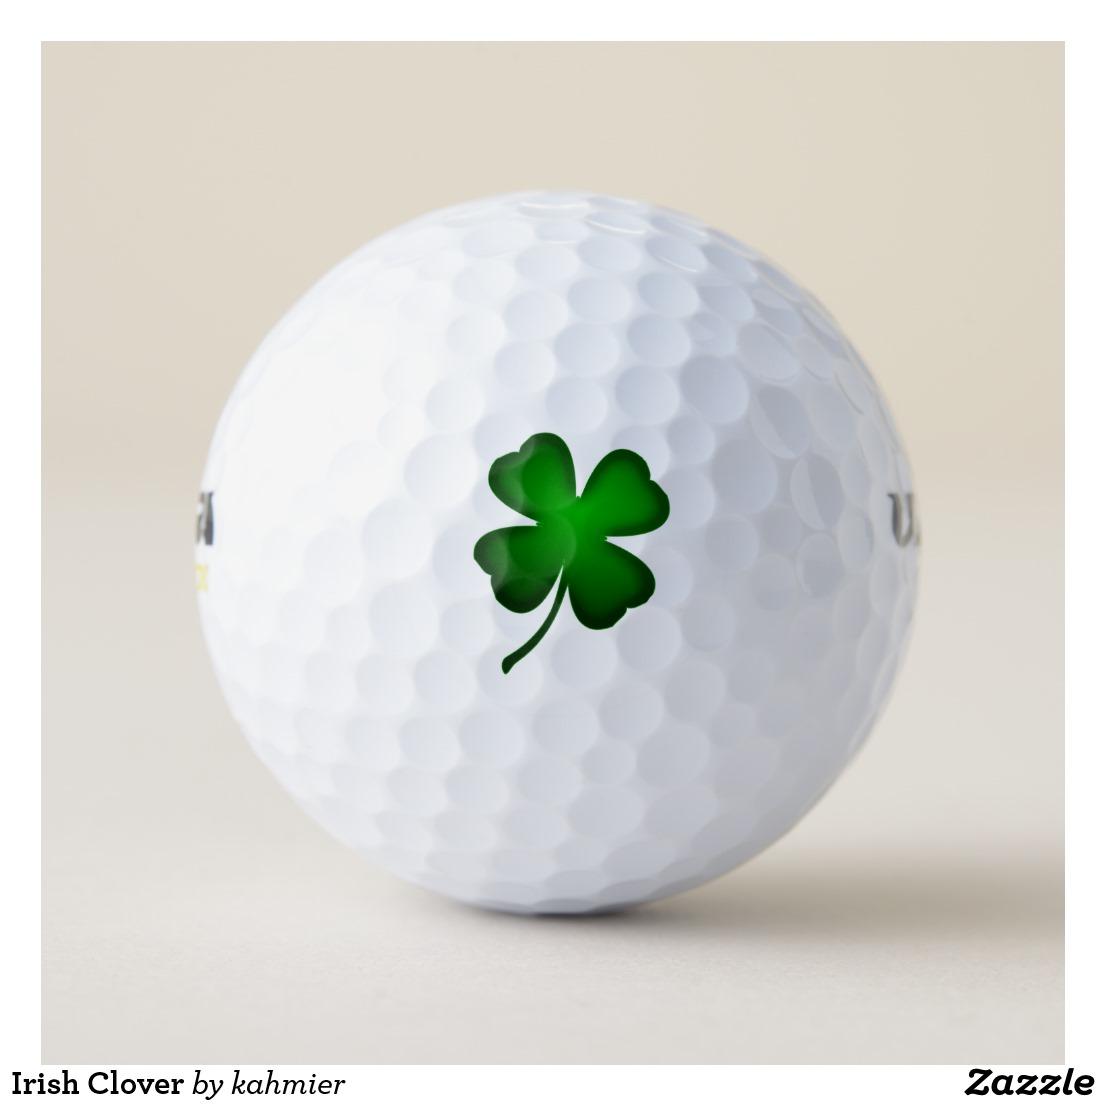 Irish Clover Golf Balls